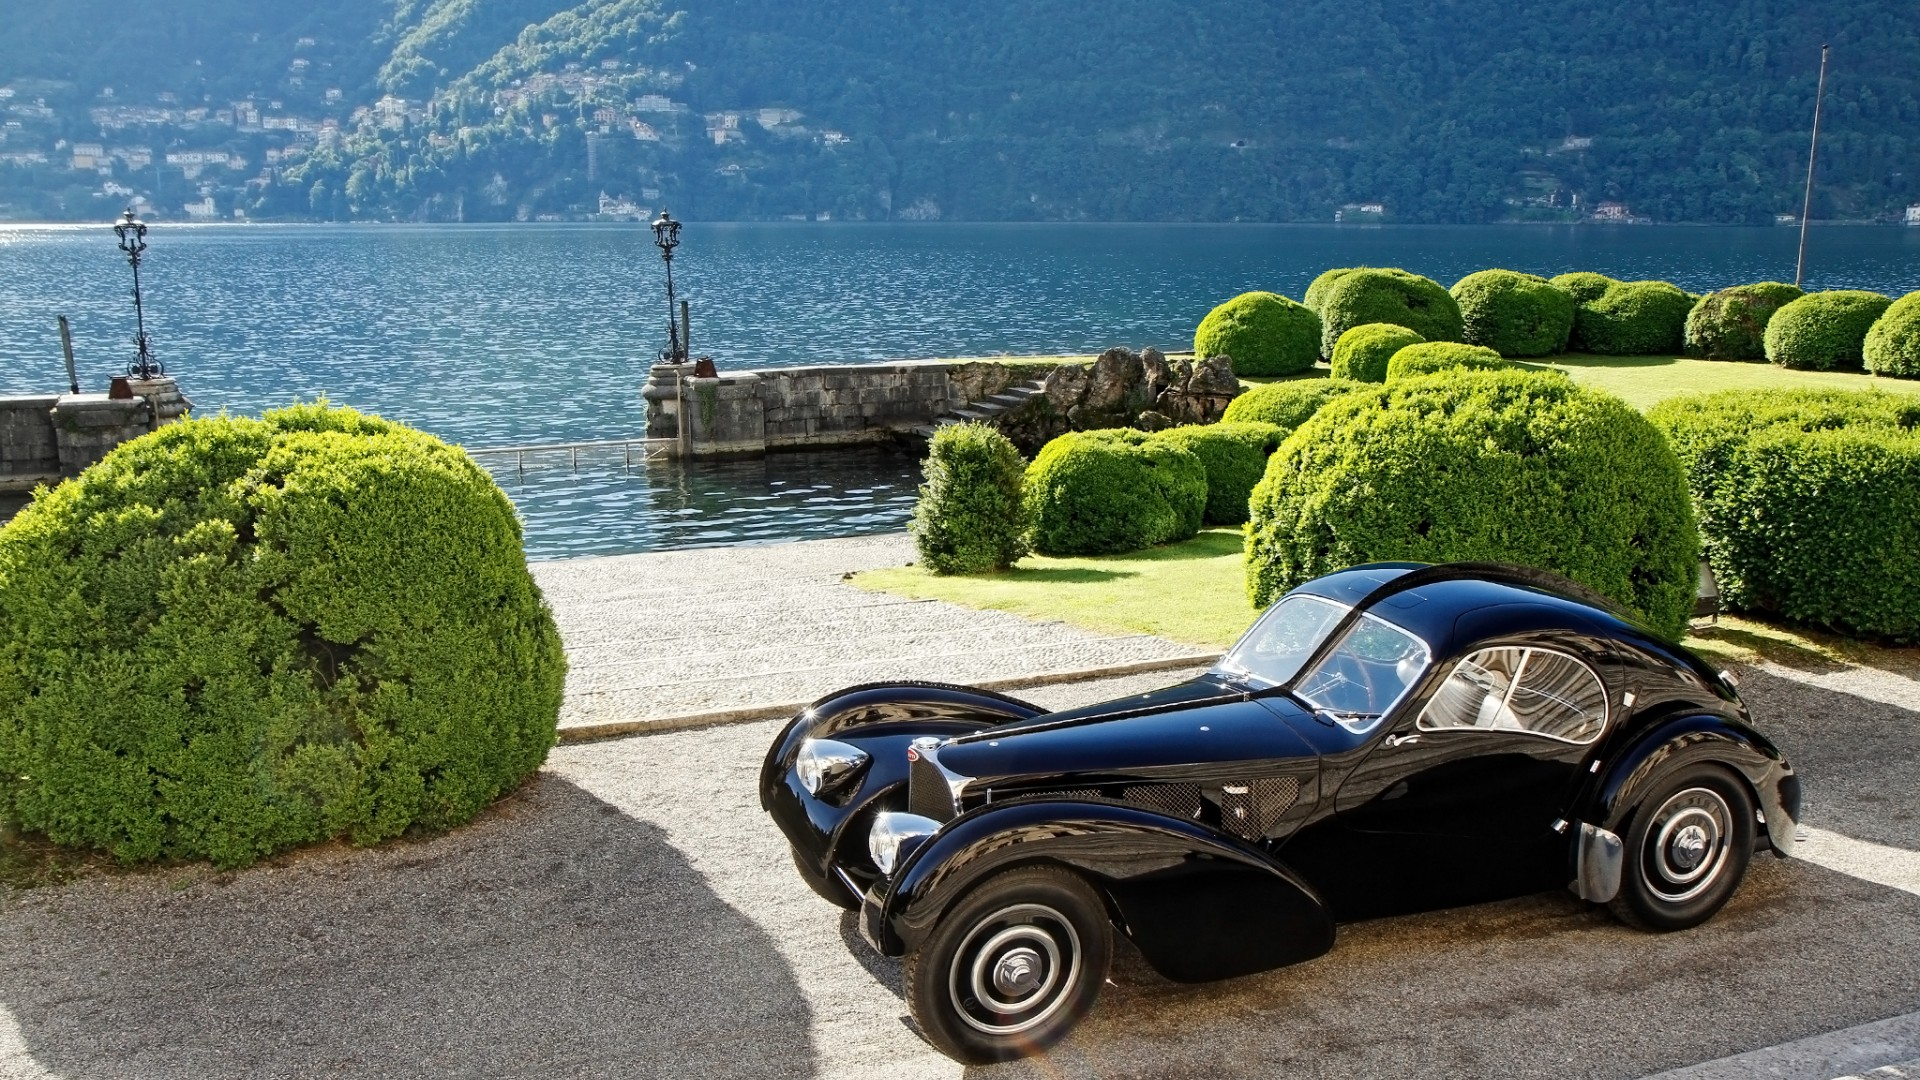 Bugatti-57SC-Atlantic-1938-1920x1080.jpg